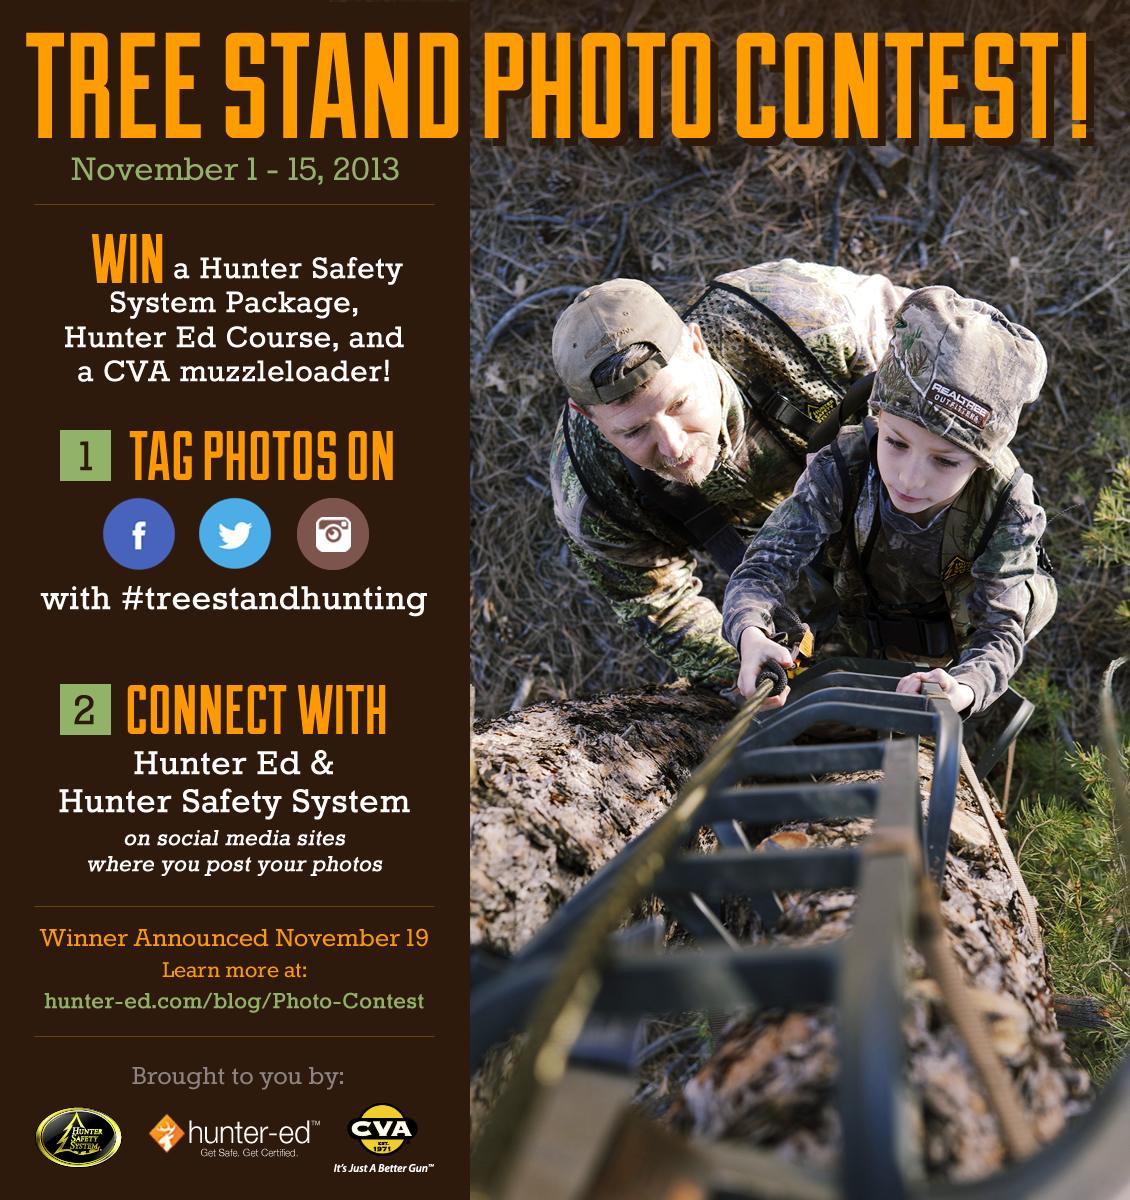 Tree Stand Photo Contest